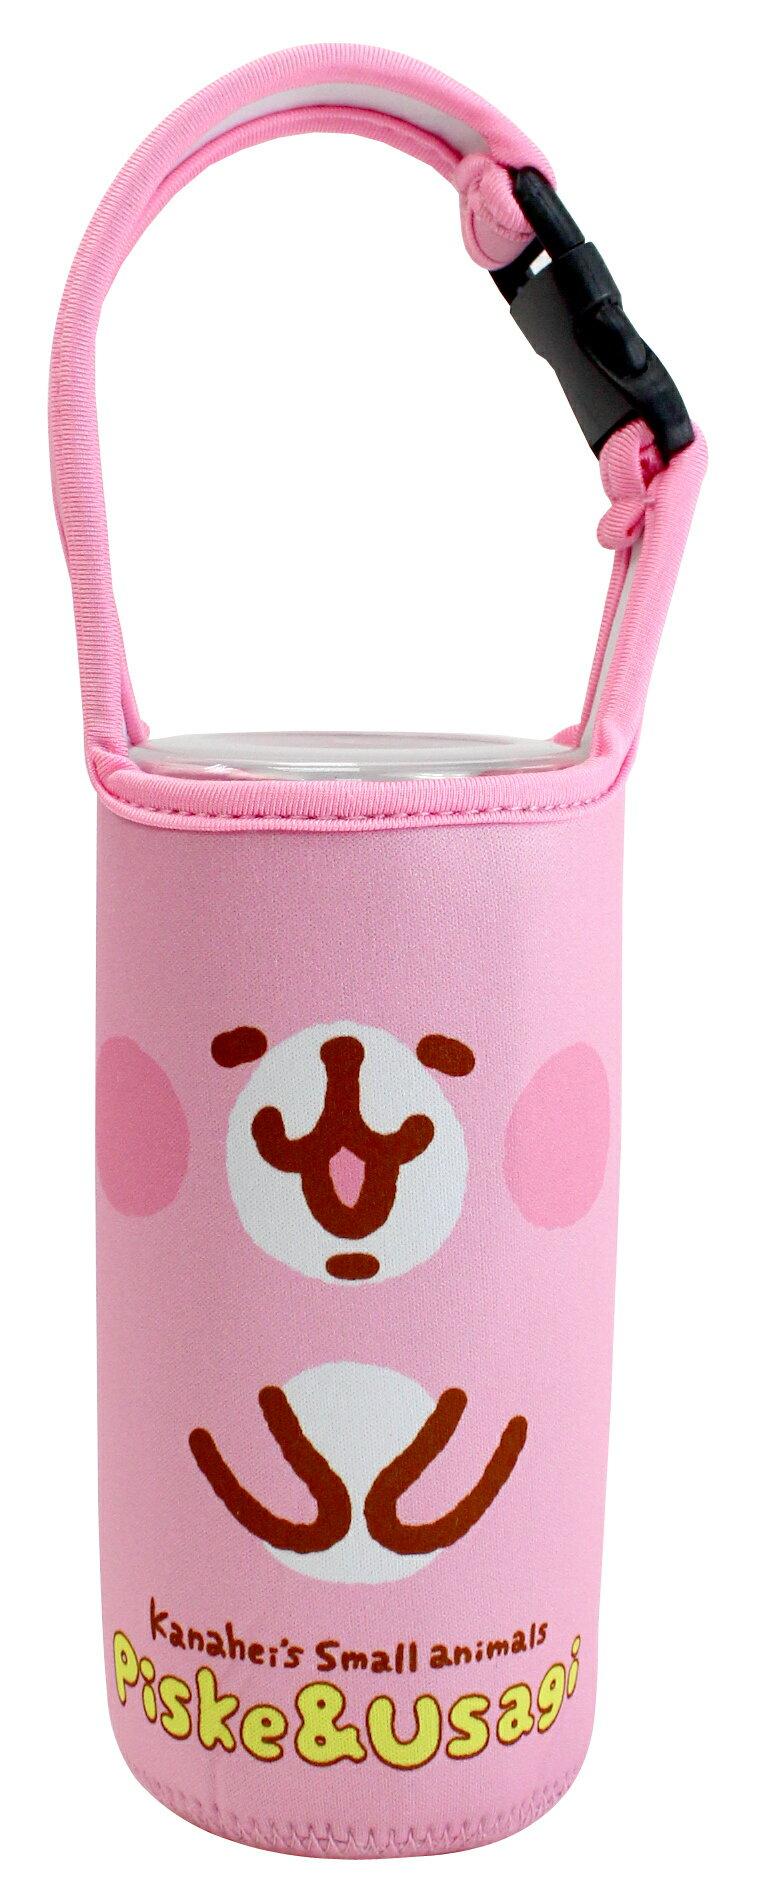 X射線【C233836】卡娜赫拉 Kanahei 潛水布水壺袋,杯套 水壺套 水壺 水壺袋 隨行杯提袋 護套 保溫袋